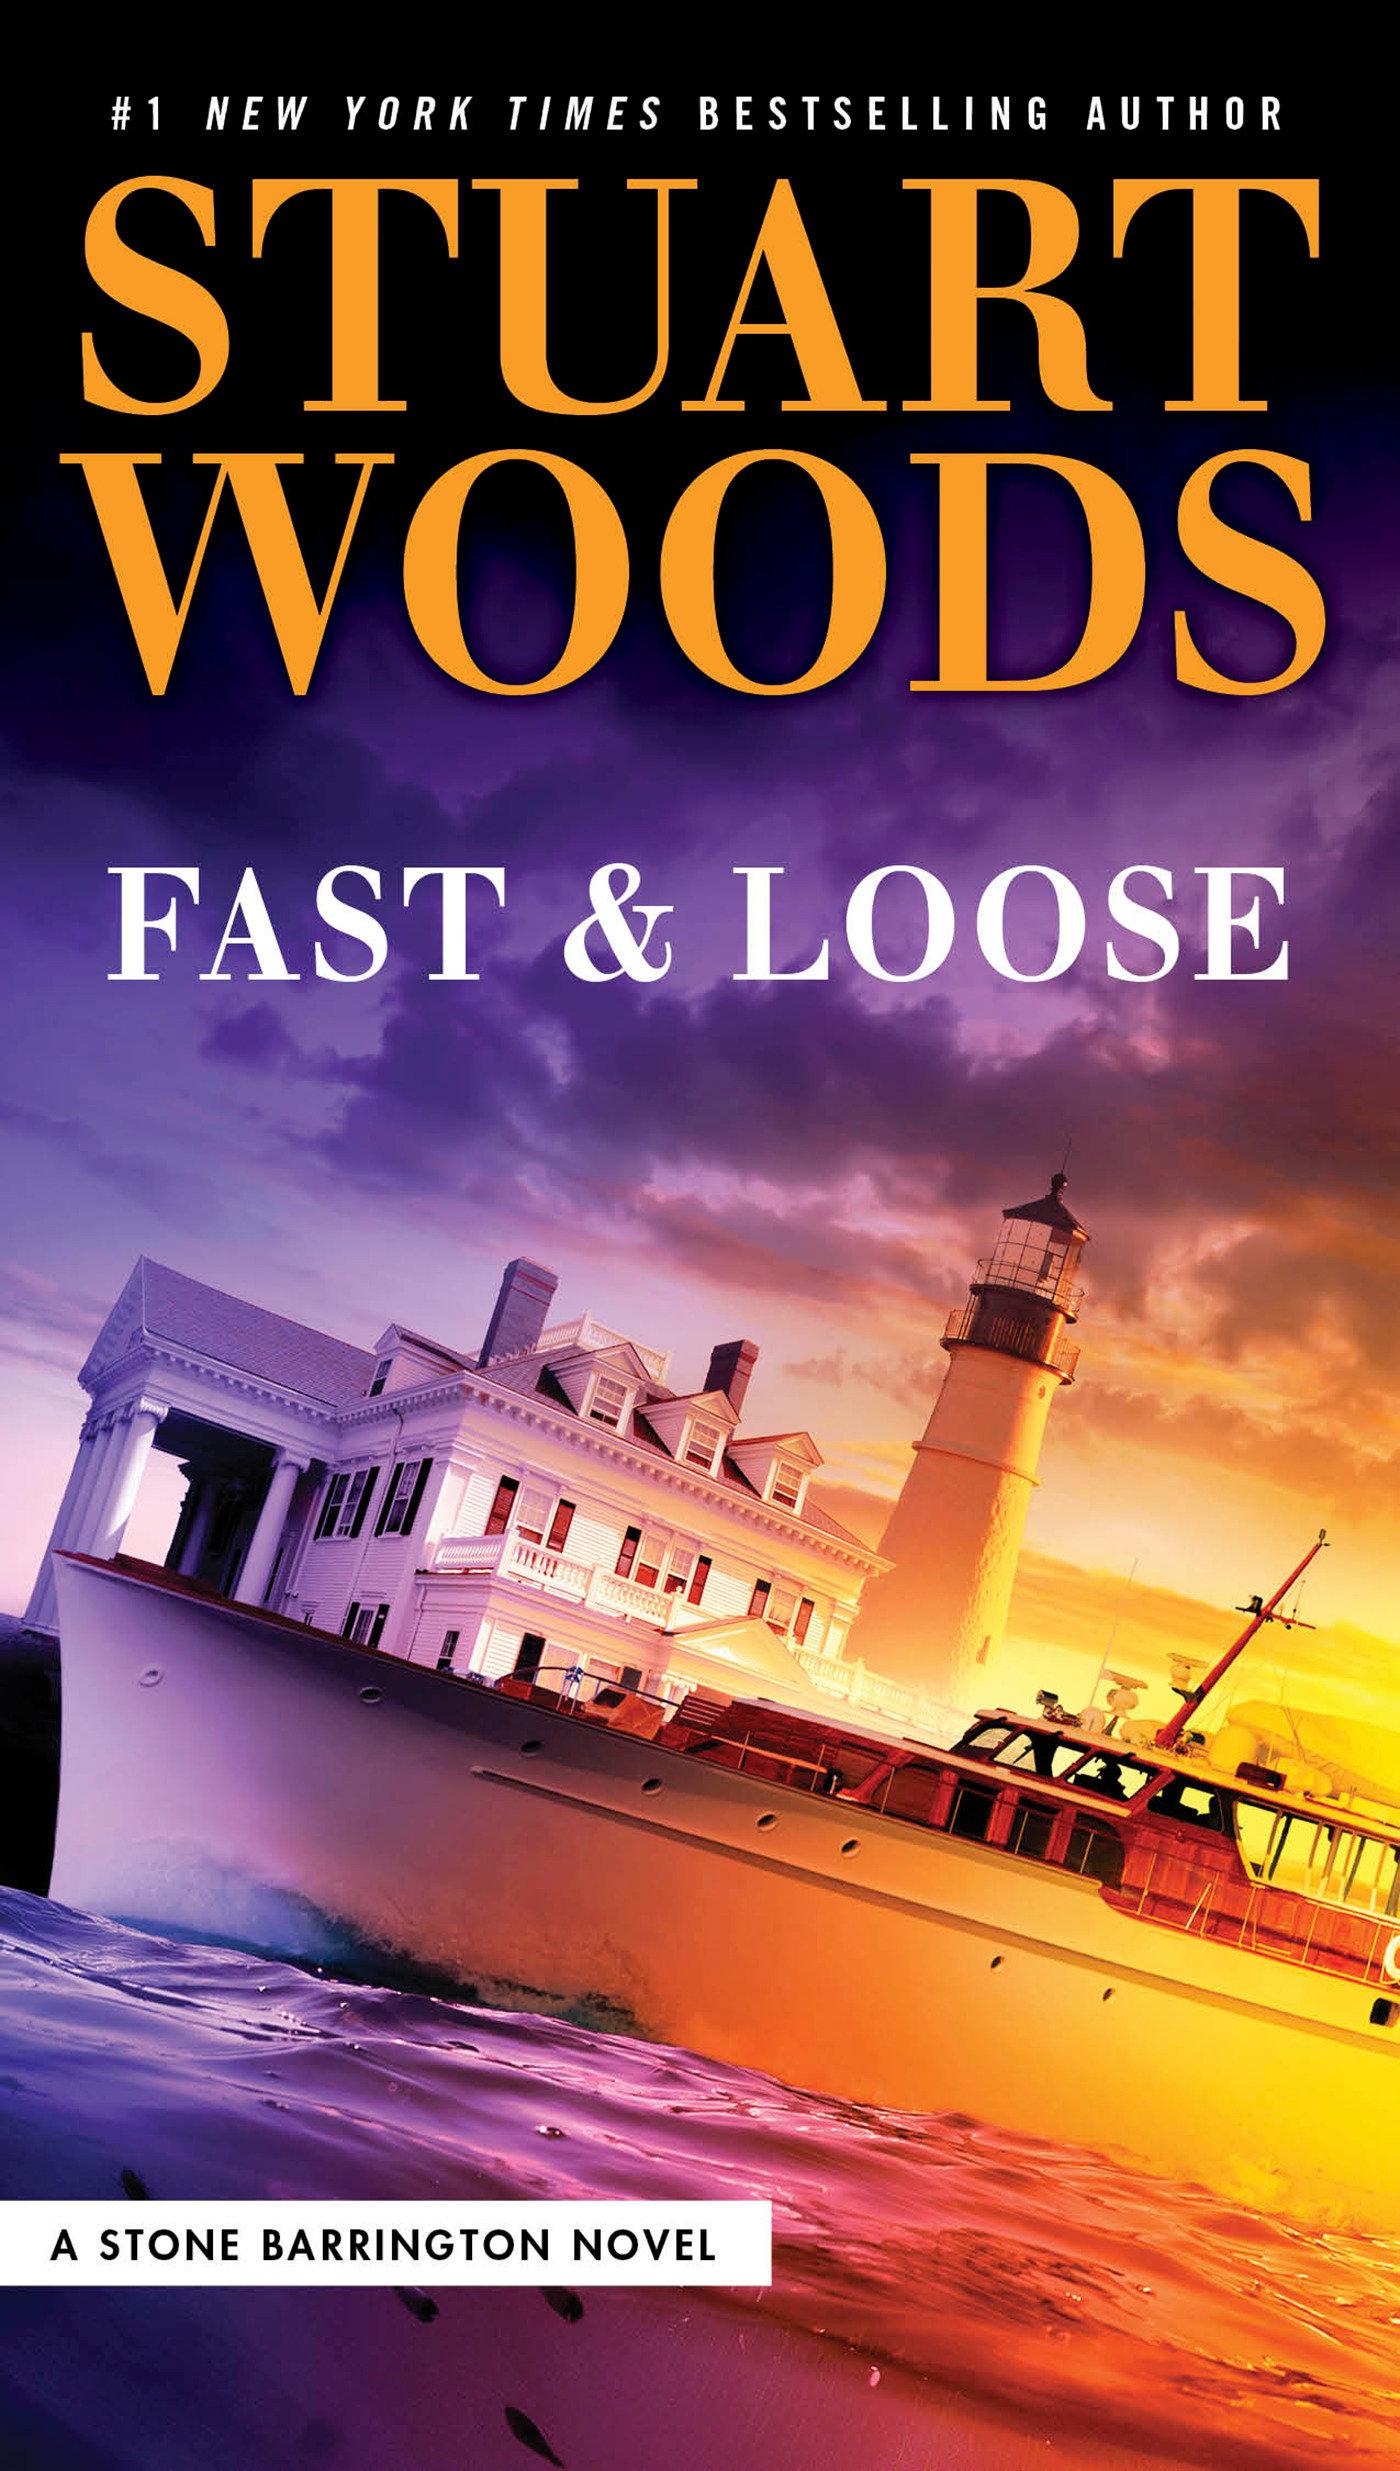 Fast and loose a Stone Barrington novel cover image